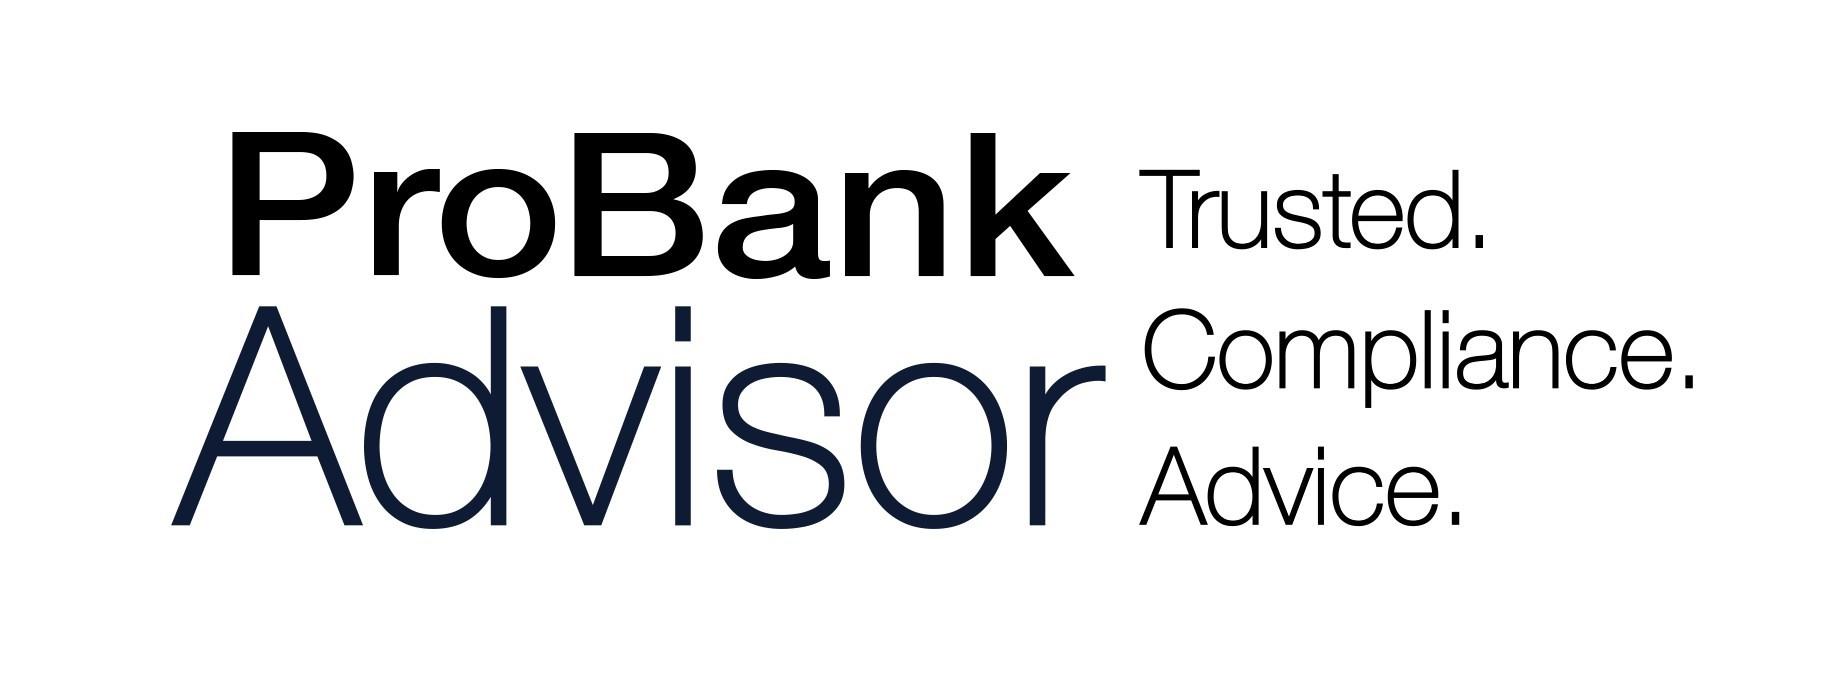 Professional Bank Services, Inc. Announces New Compliance